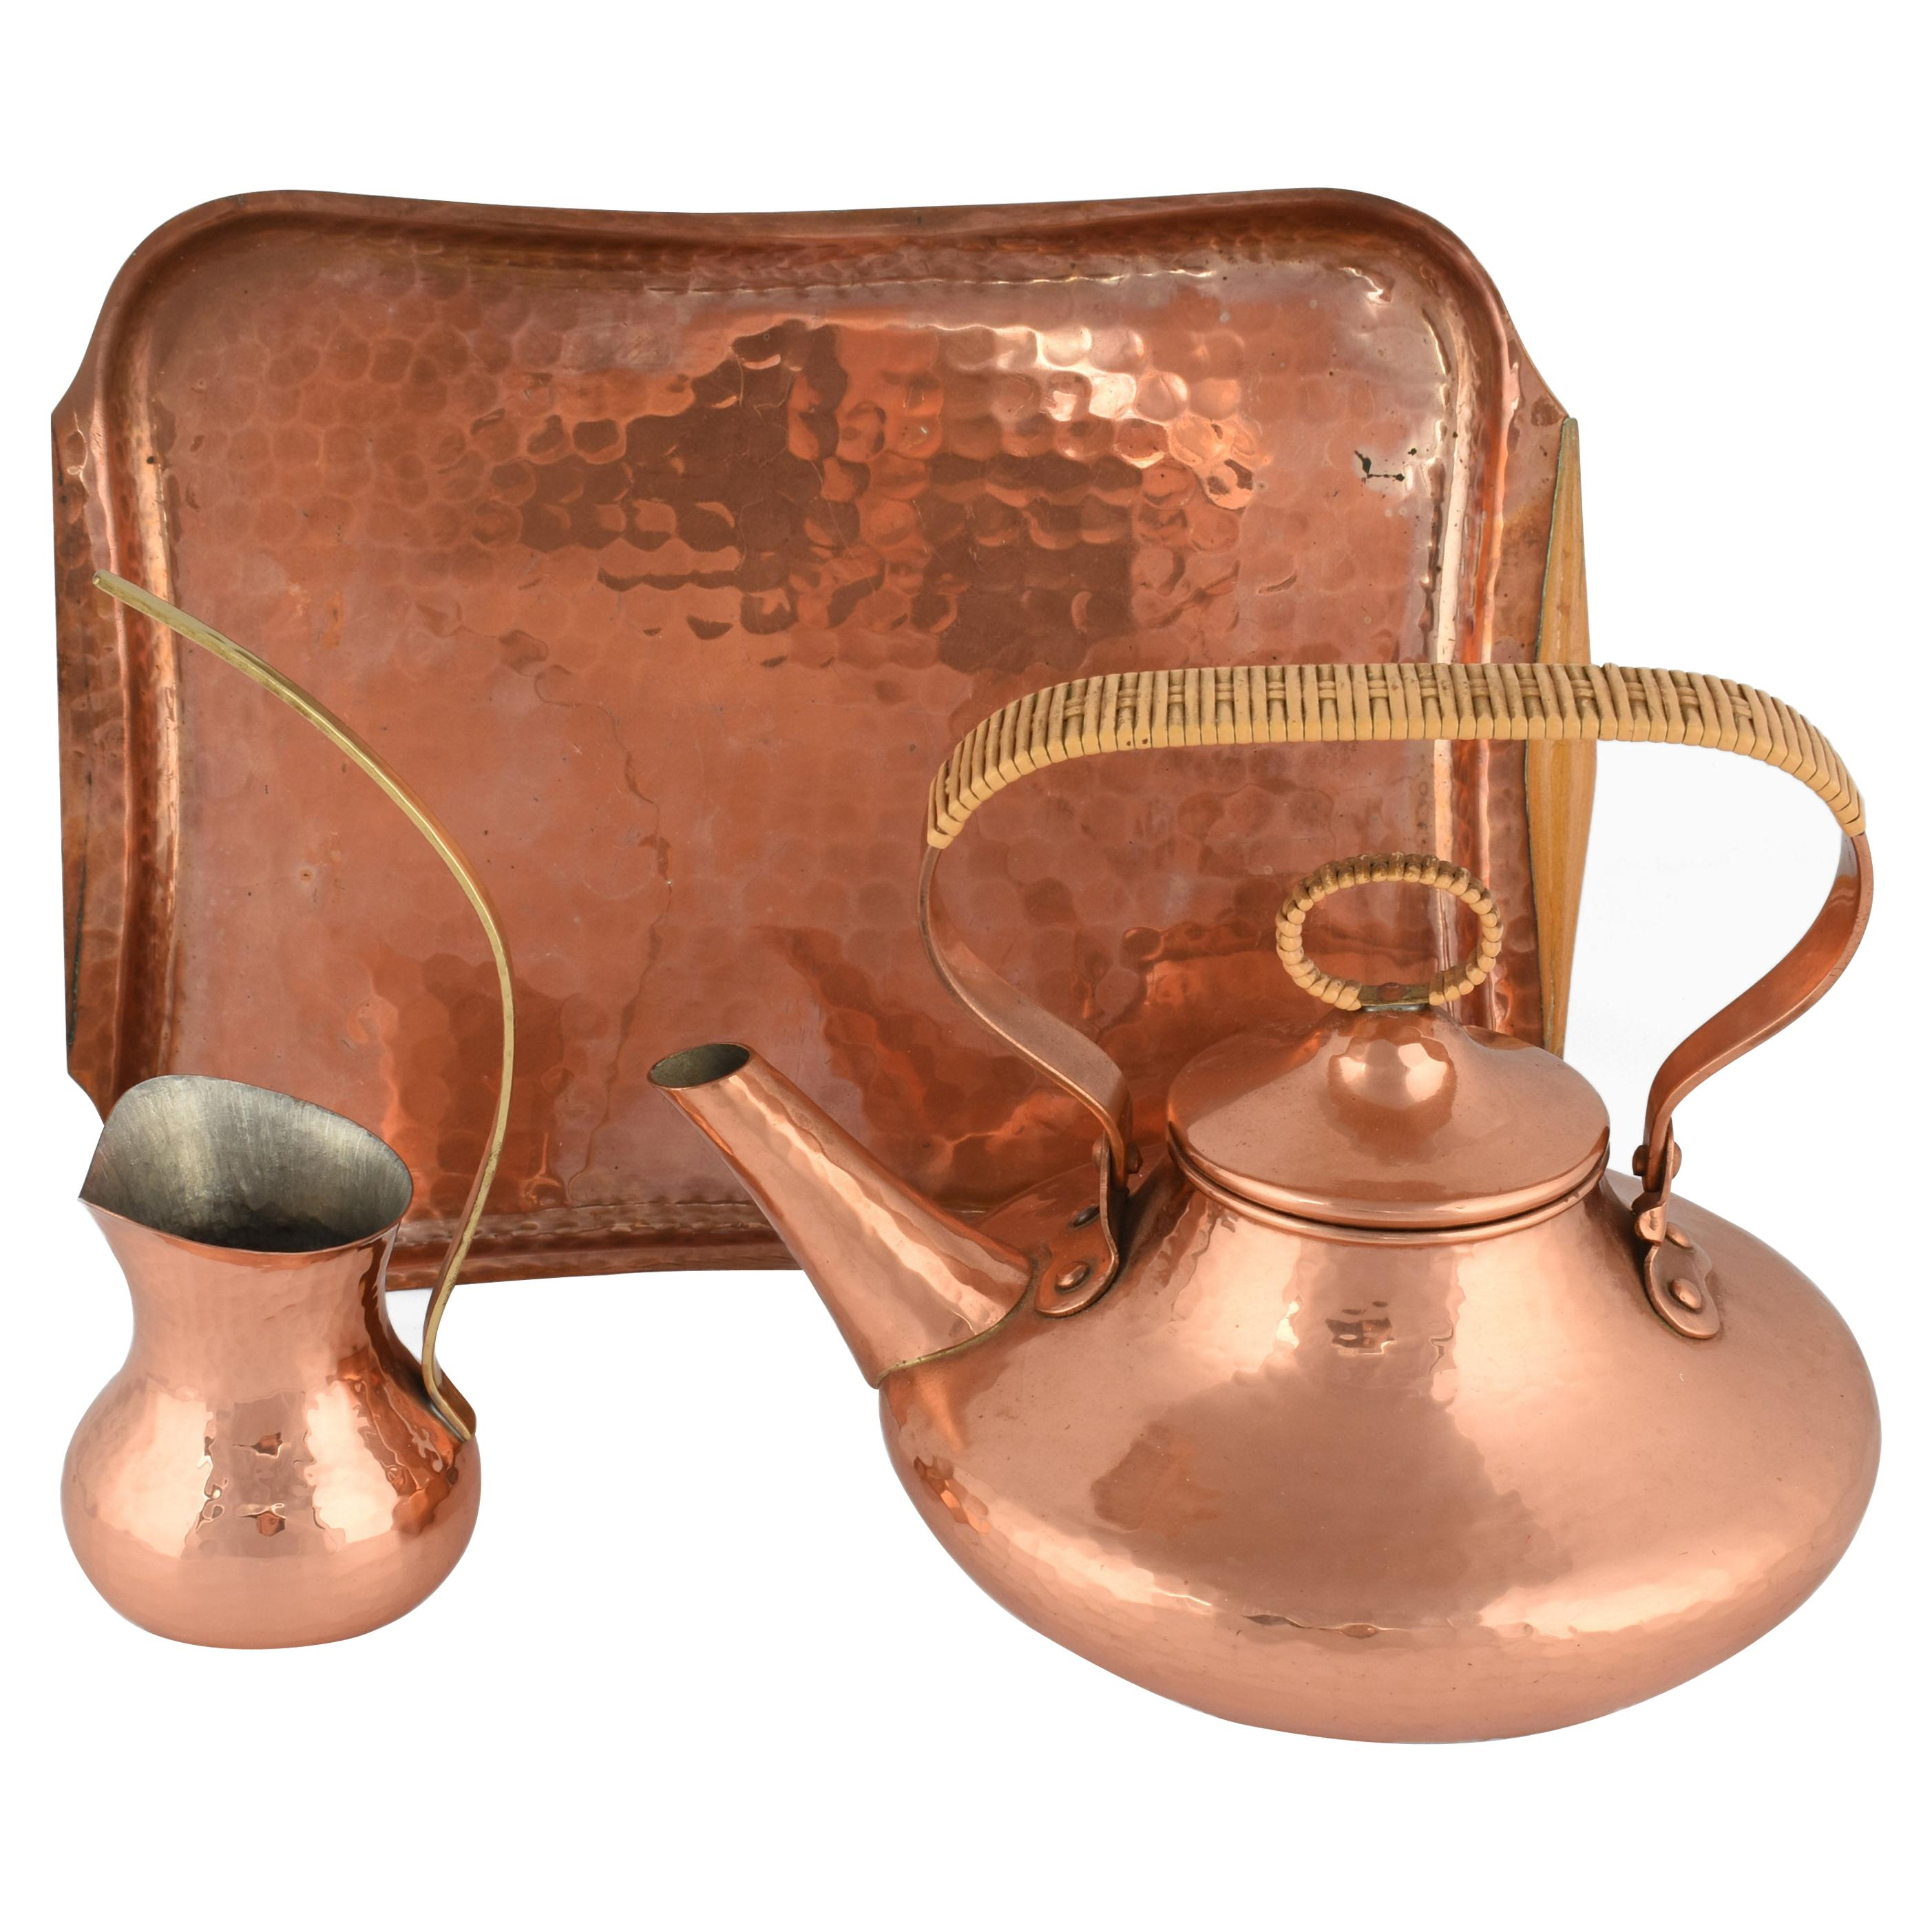 Vintage Copper Centerpiece and Tea Set by Eugen Zint, Germany, 1950s